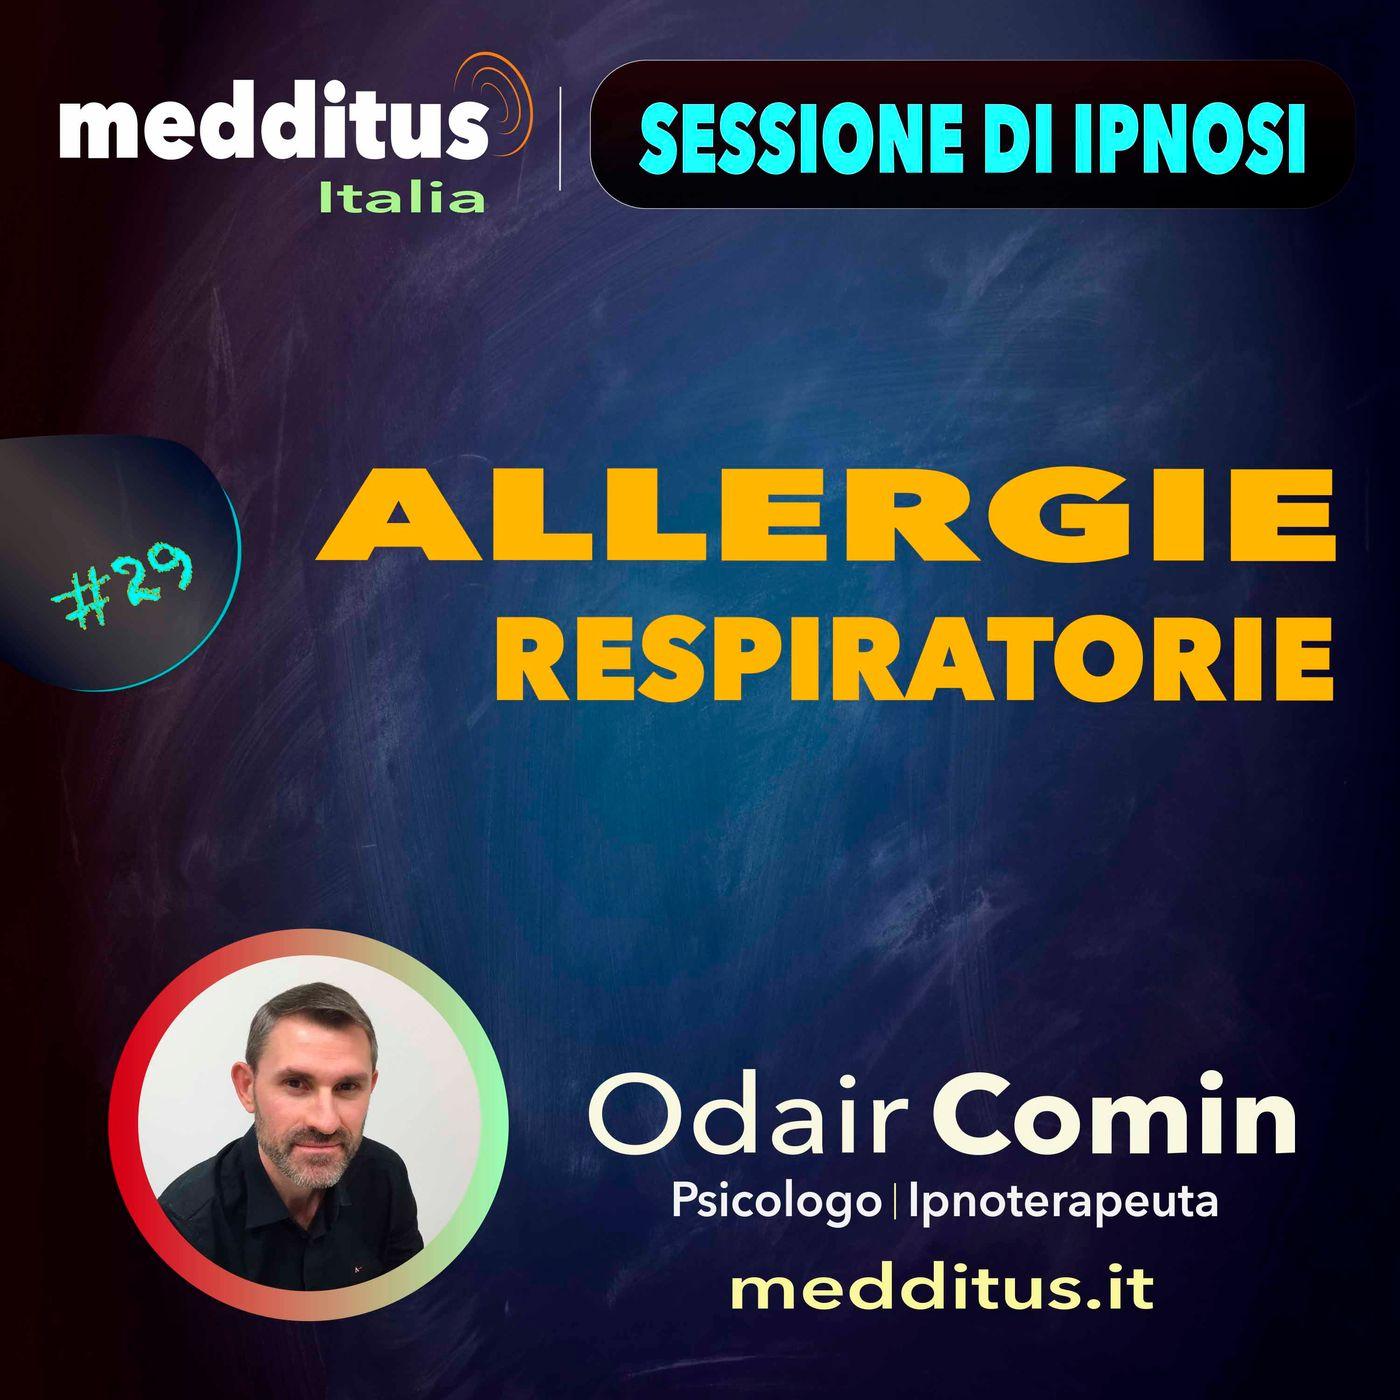 #29 Ipnosi per Allergie Respiratorie   Odair Comin